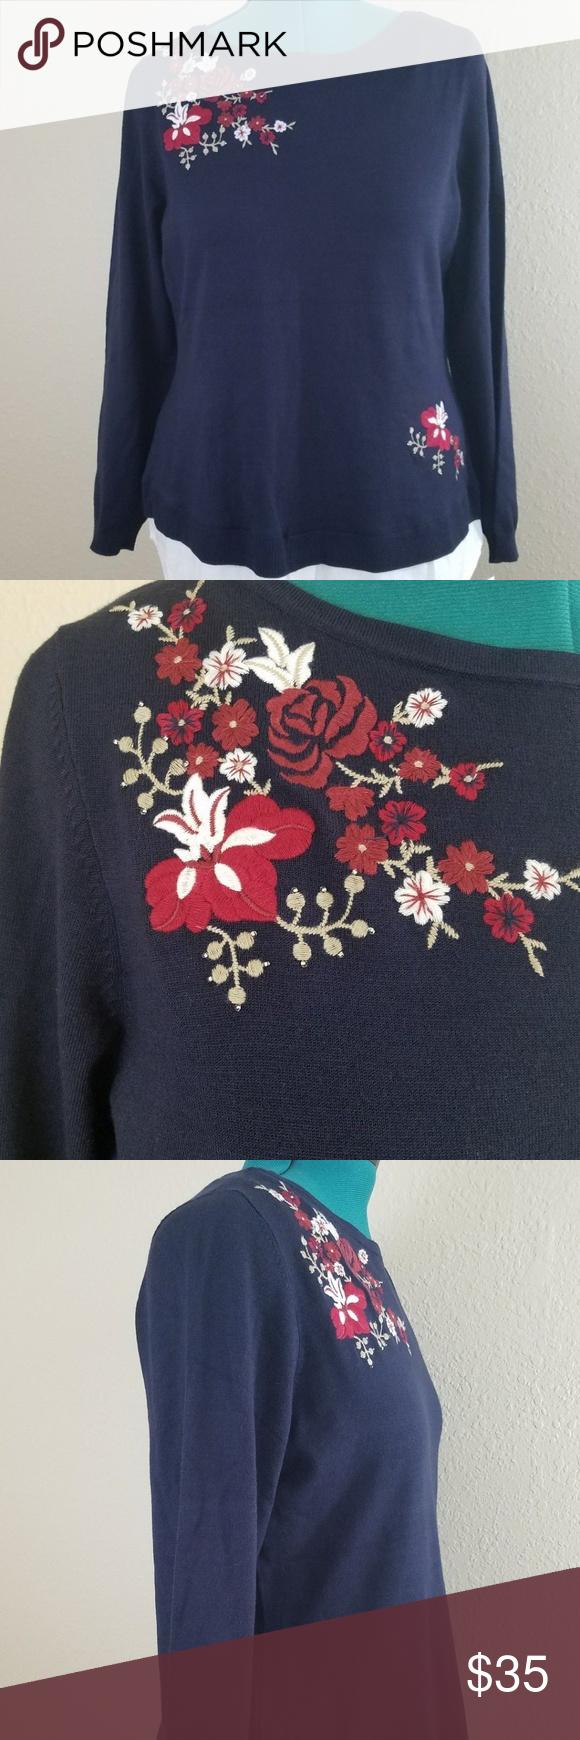 Shirt Sweater Xl Navy White Blouse Combo Nwt In 2018 My Posh Picks